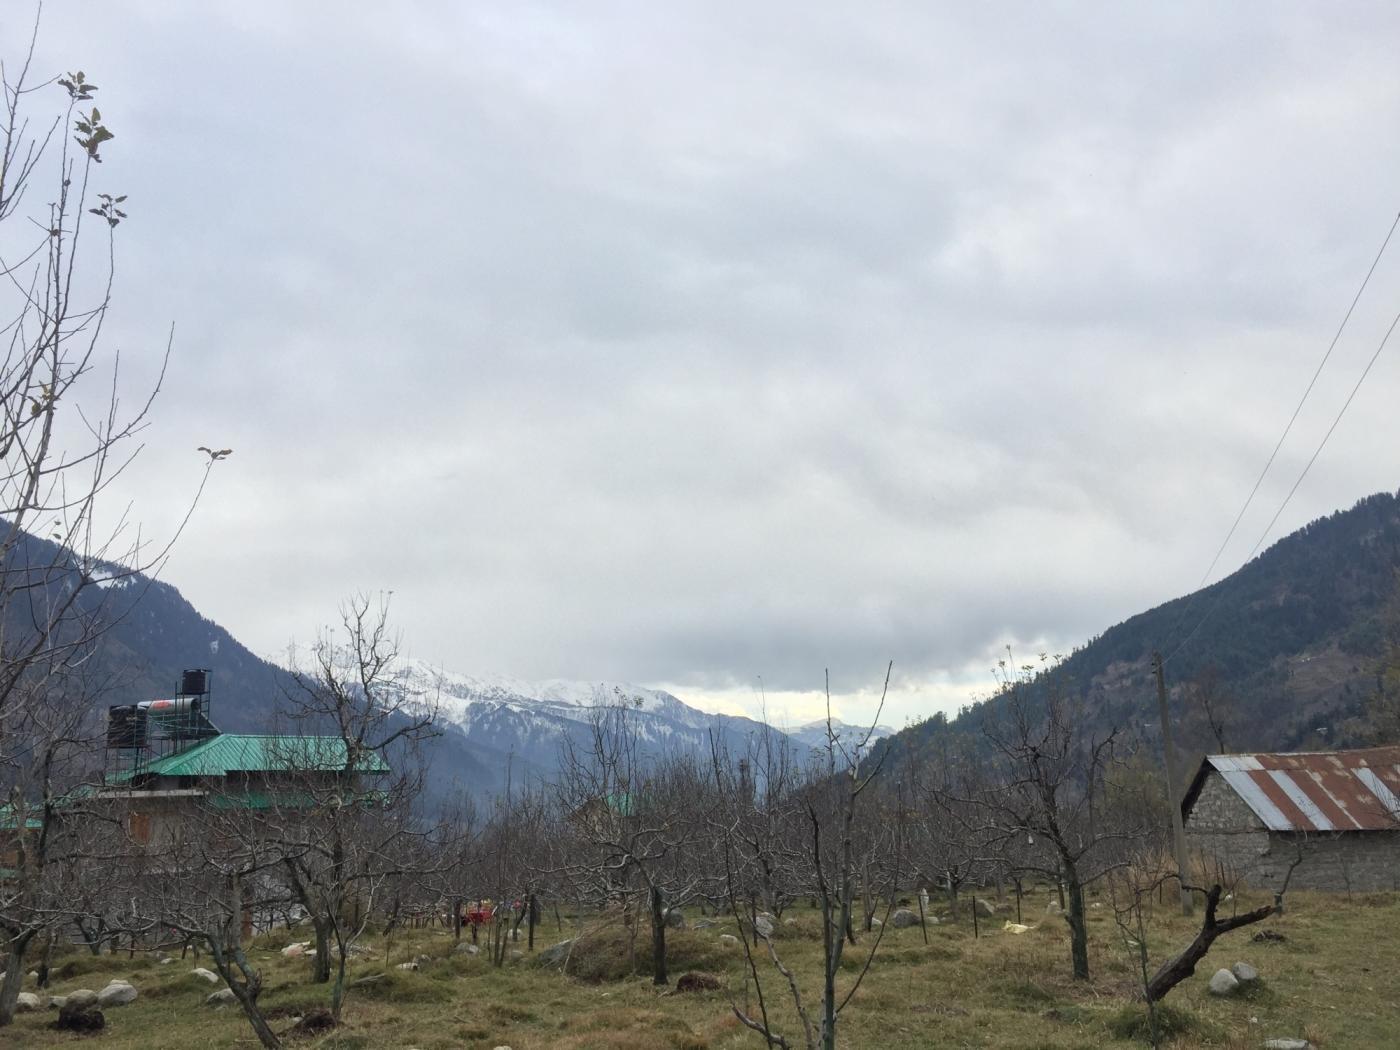 Shanag village. by .